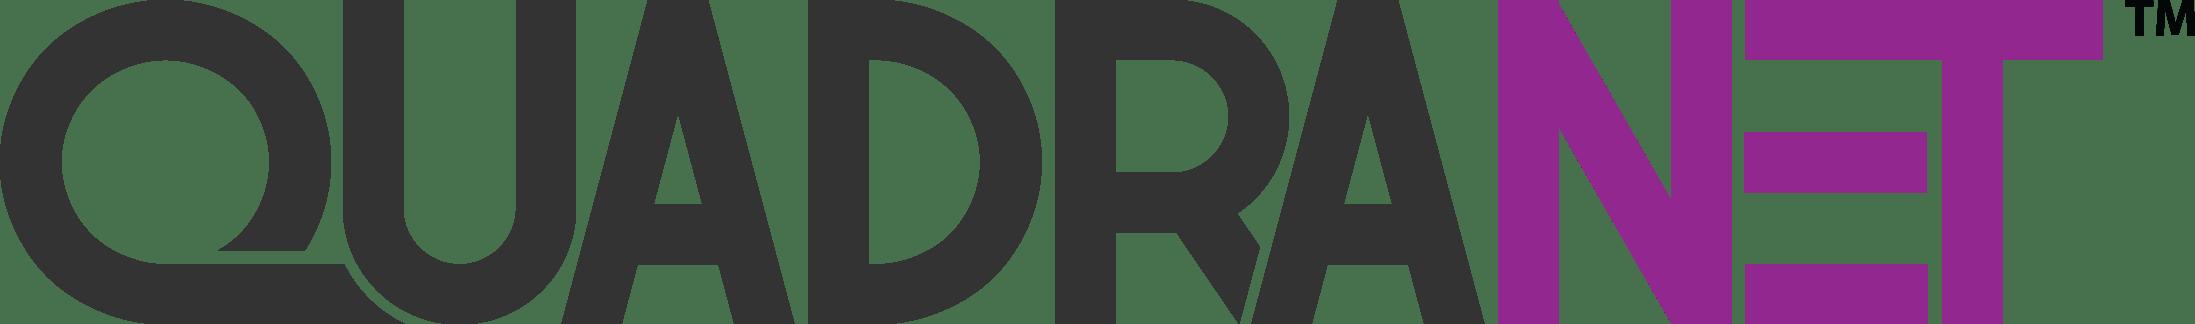 QuadraNet company logo